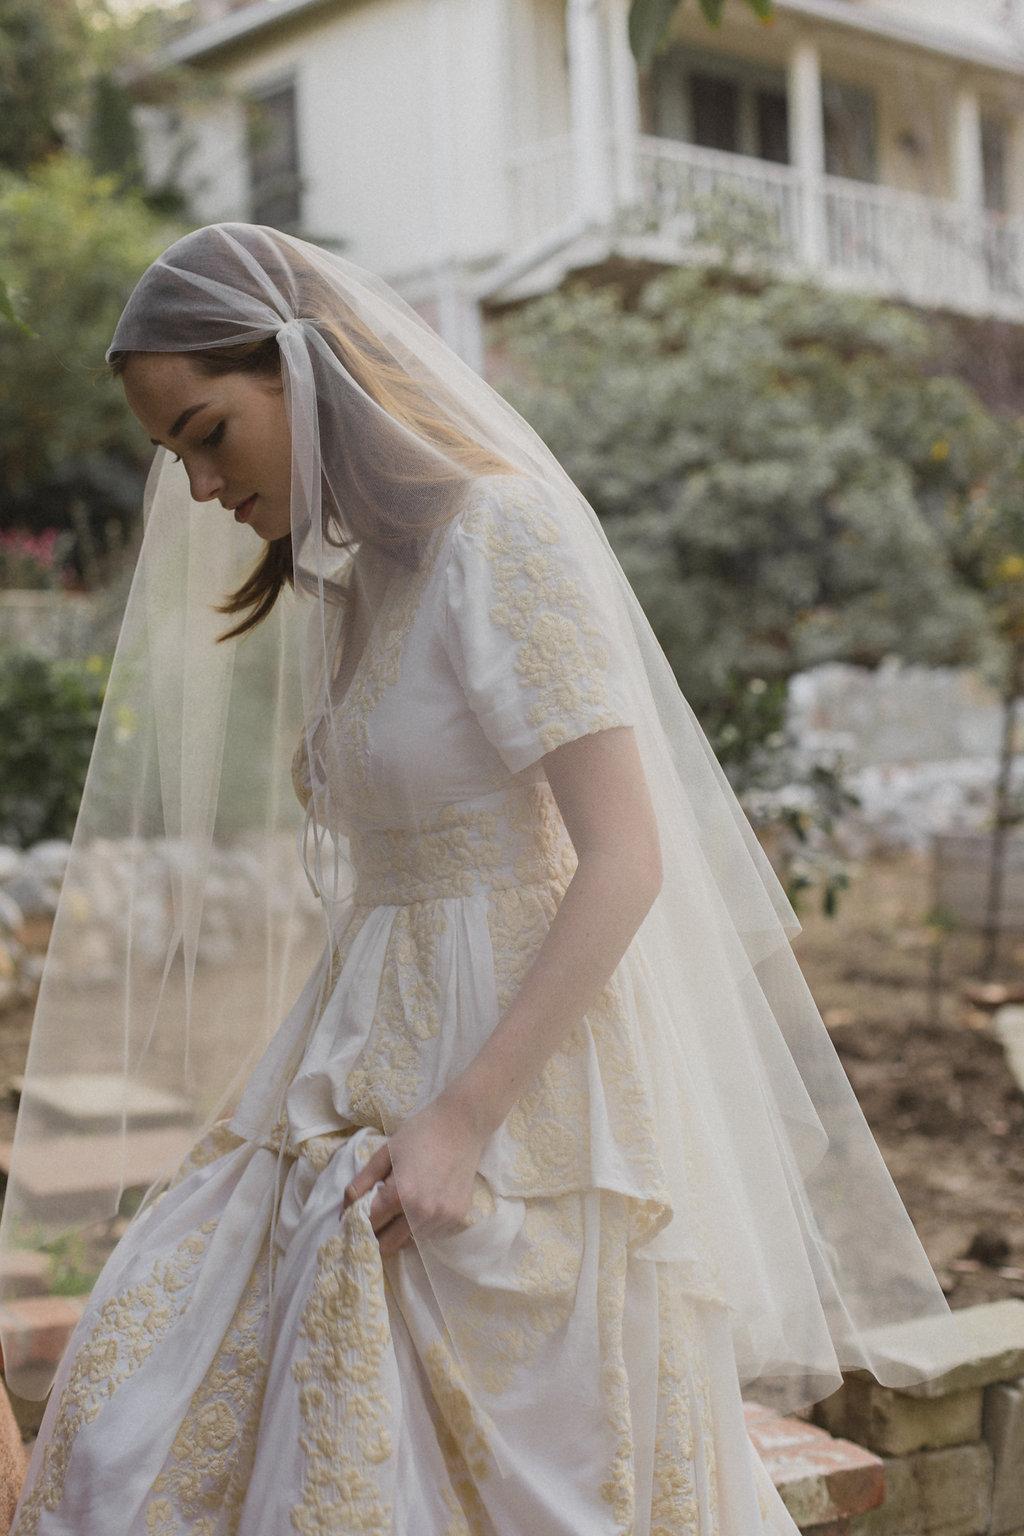 Juliet cap wedding veils, bridal veil, blusher veil, bridal veil ...